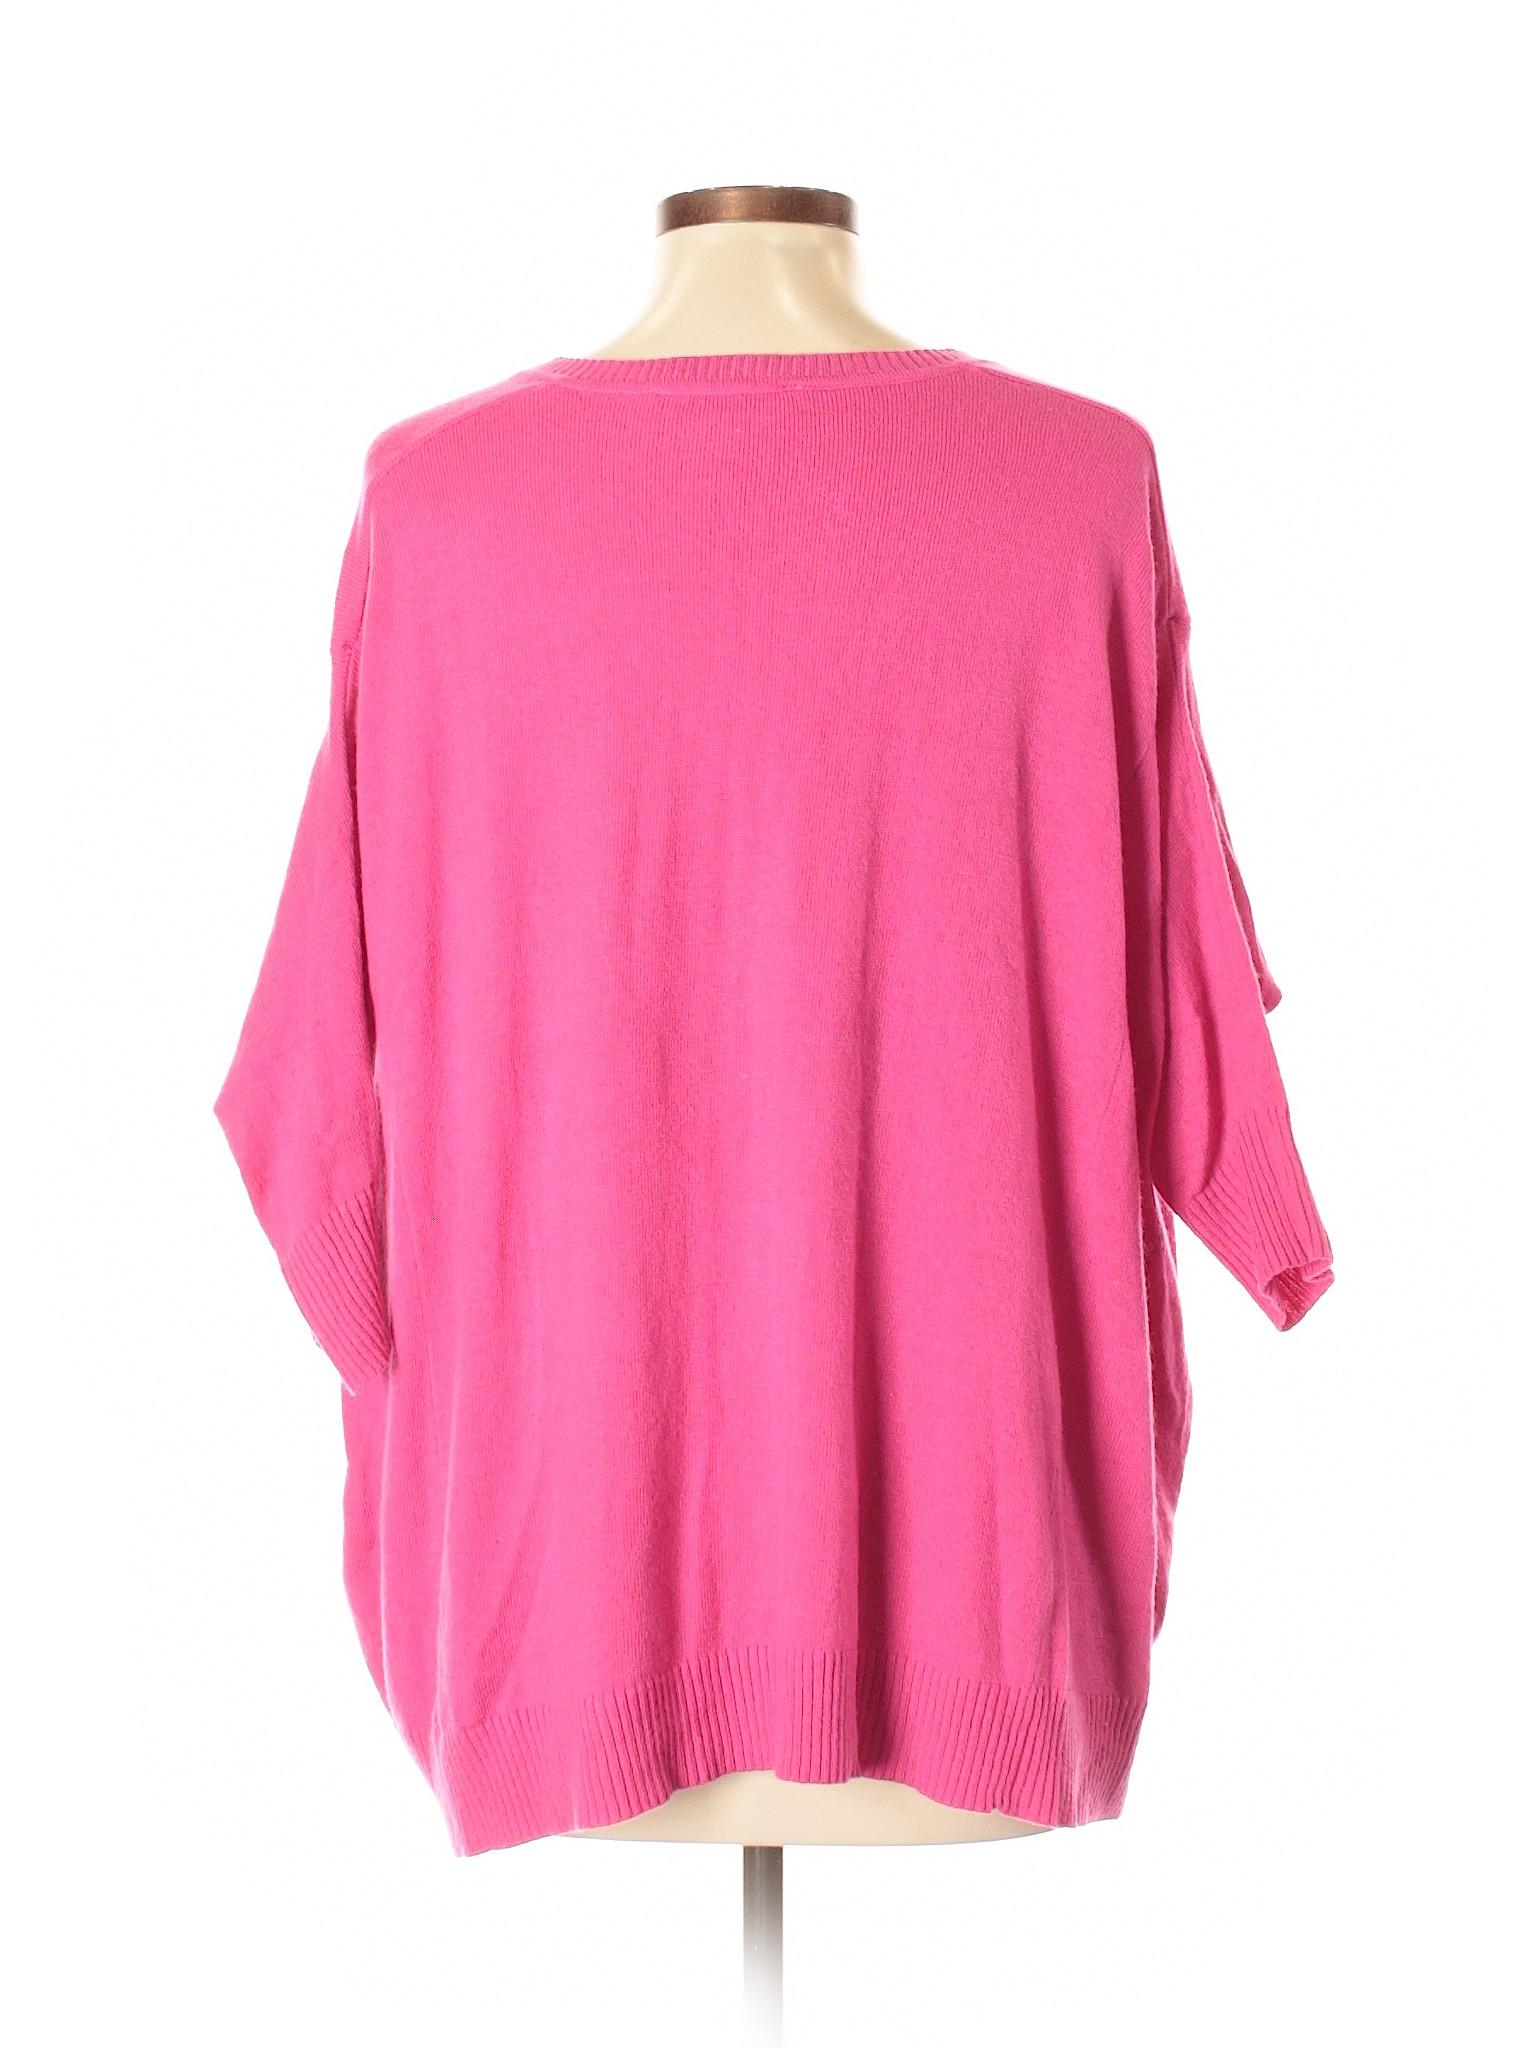 Pullover Boutique Impeccable The Sweater winter Pig IqrI1